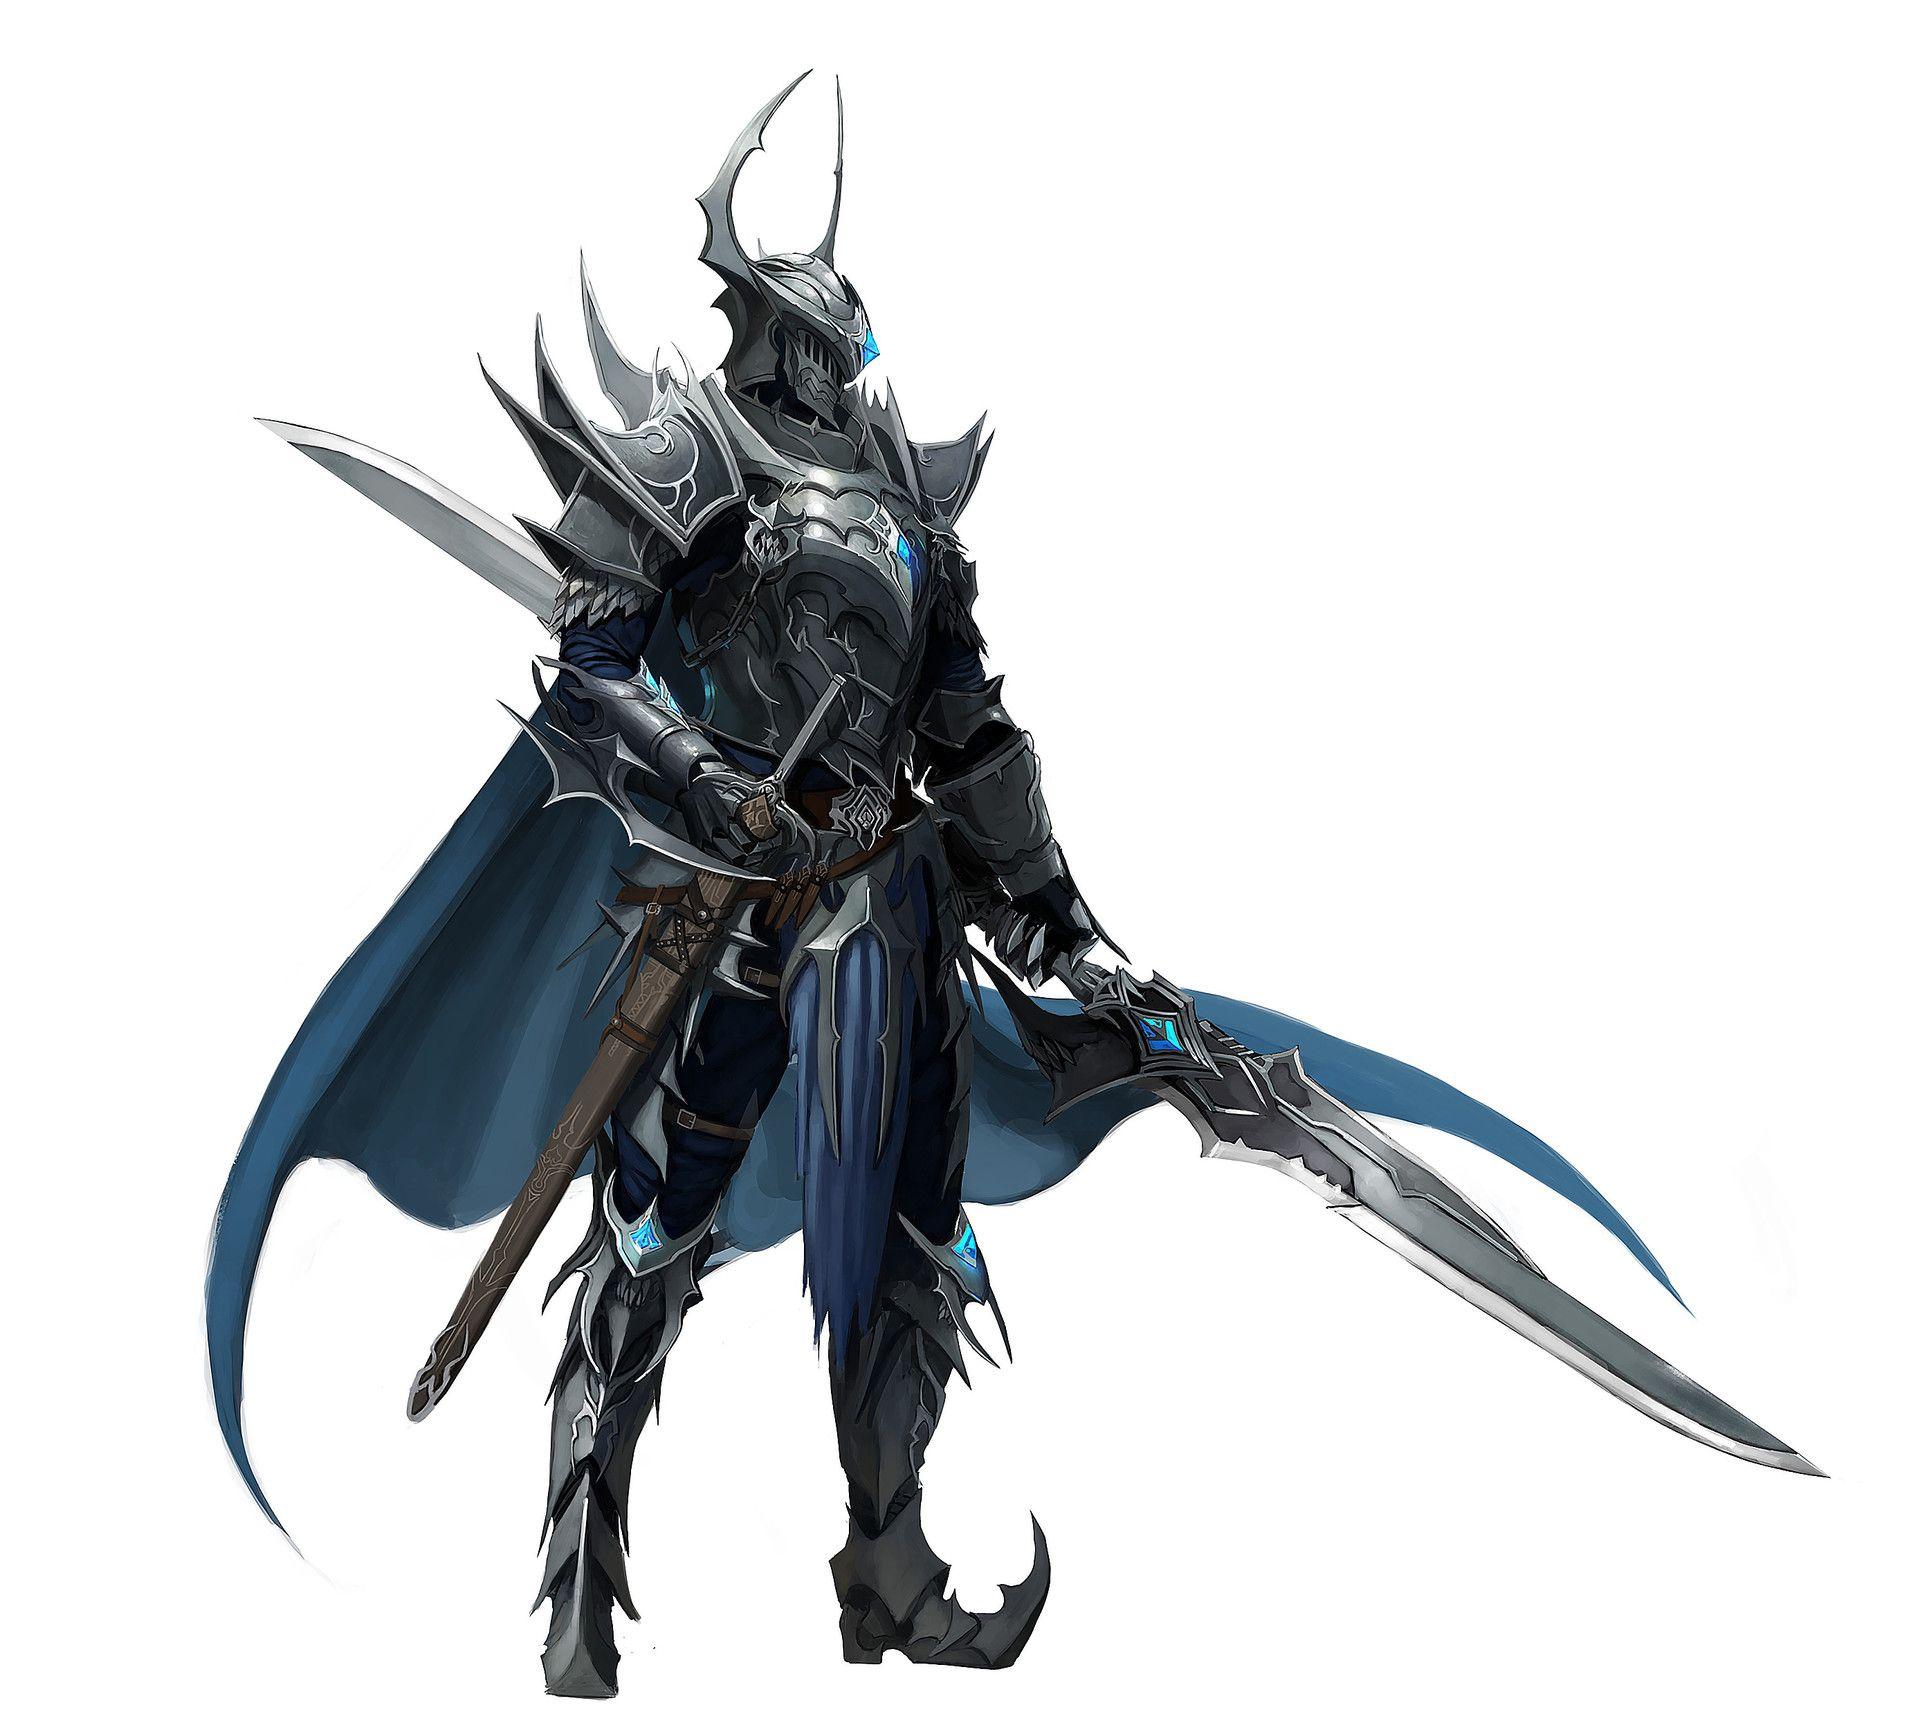 Artstation Dragon Knight O Gok Dragon Knight Fantasy Character Design Dragon Armor Download dark knights, warrior, battle, fantasy, art wallpaper, 1080x1920, samsung galaxy s4, s5, note, sony xperia z, z1, z2, z3, htc one, lenovo vibe, google pixel 2, oneplus 5, honor 9, xiaomi redmi note 4, lenovo p2, lenovo k8. dragon knight fantasy character design